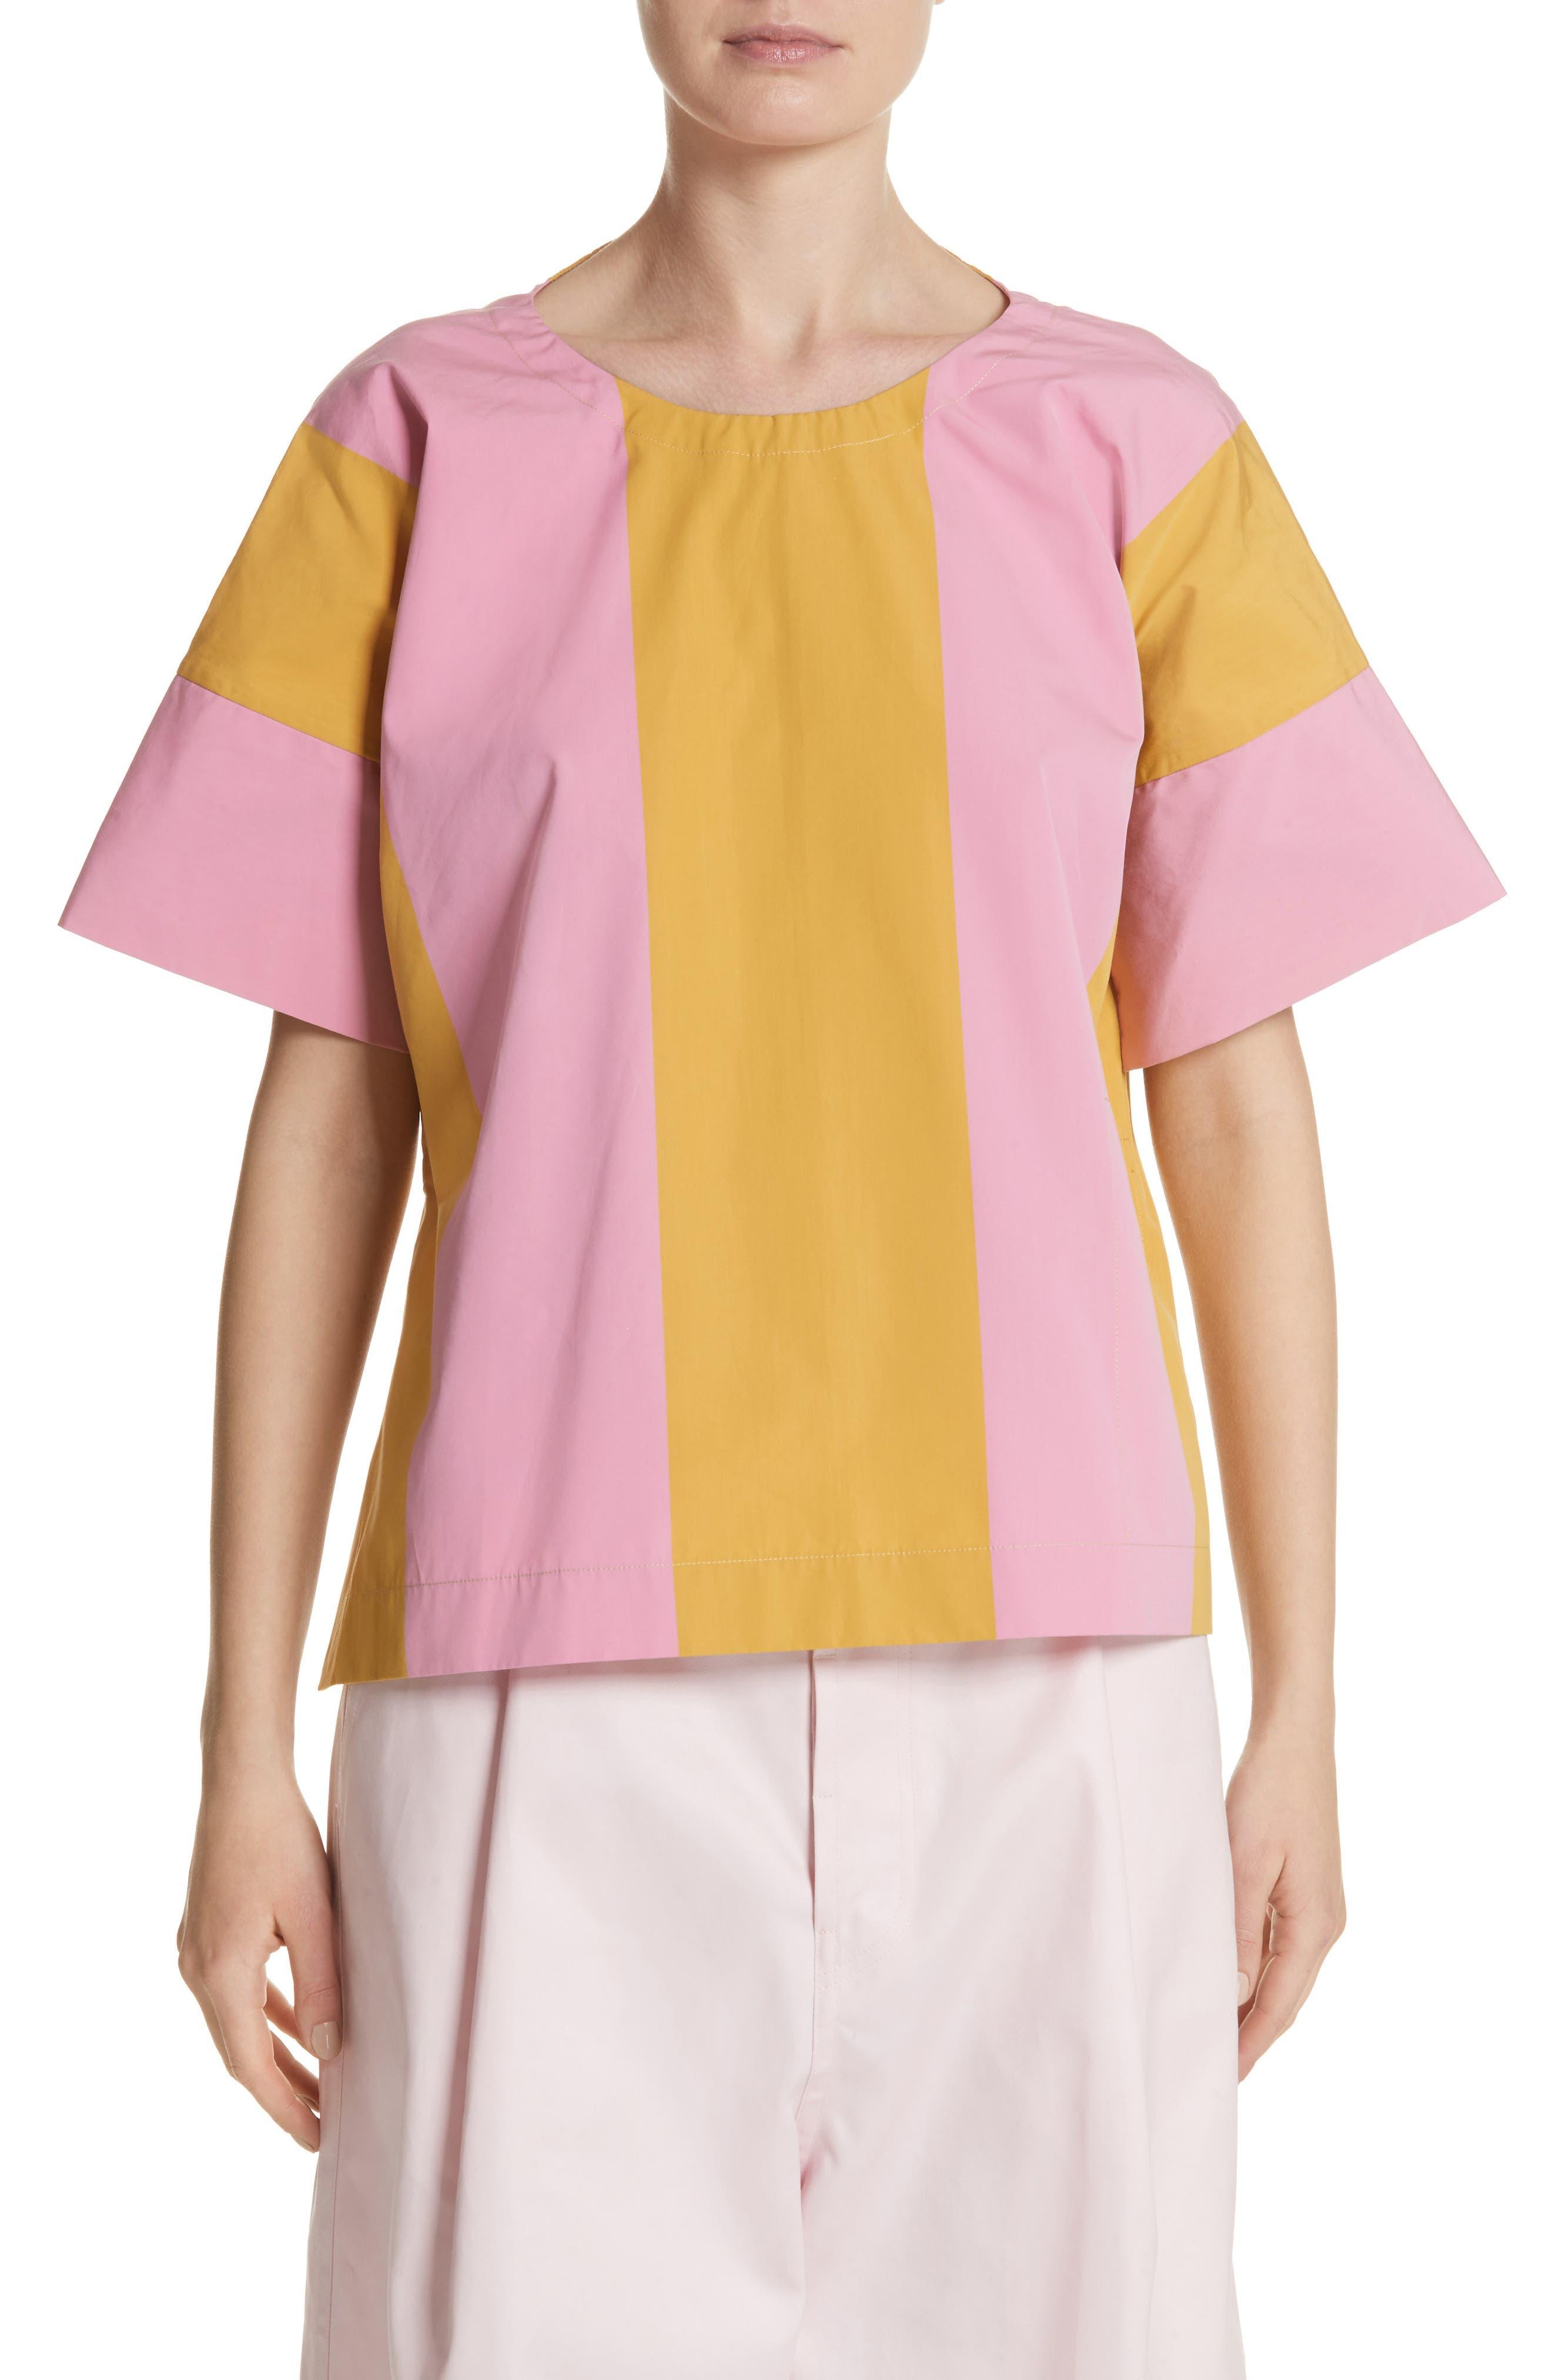 T-Top Side Slit Blouse,                         Main,                         color, Rose/Banana